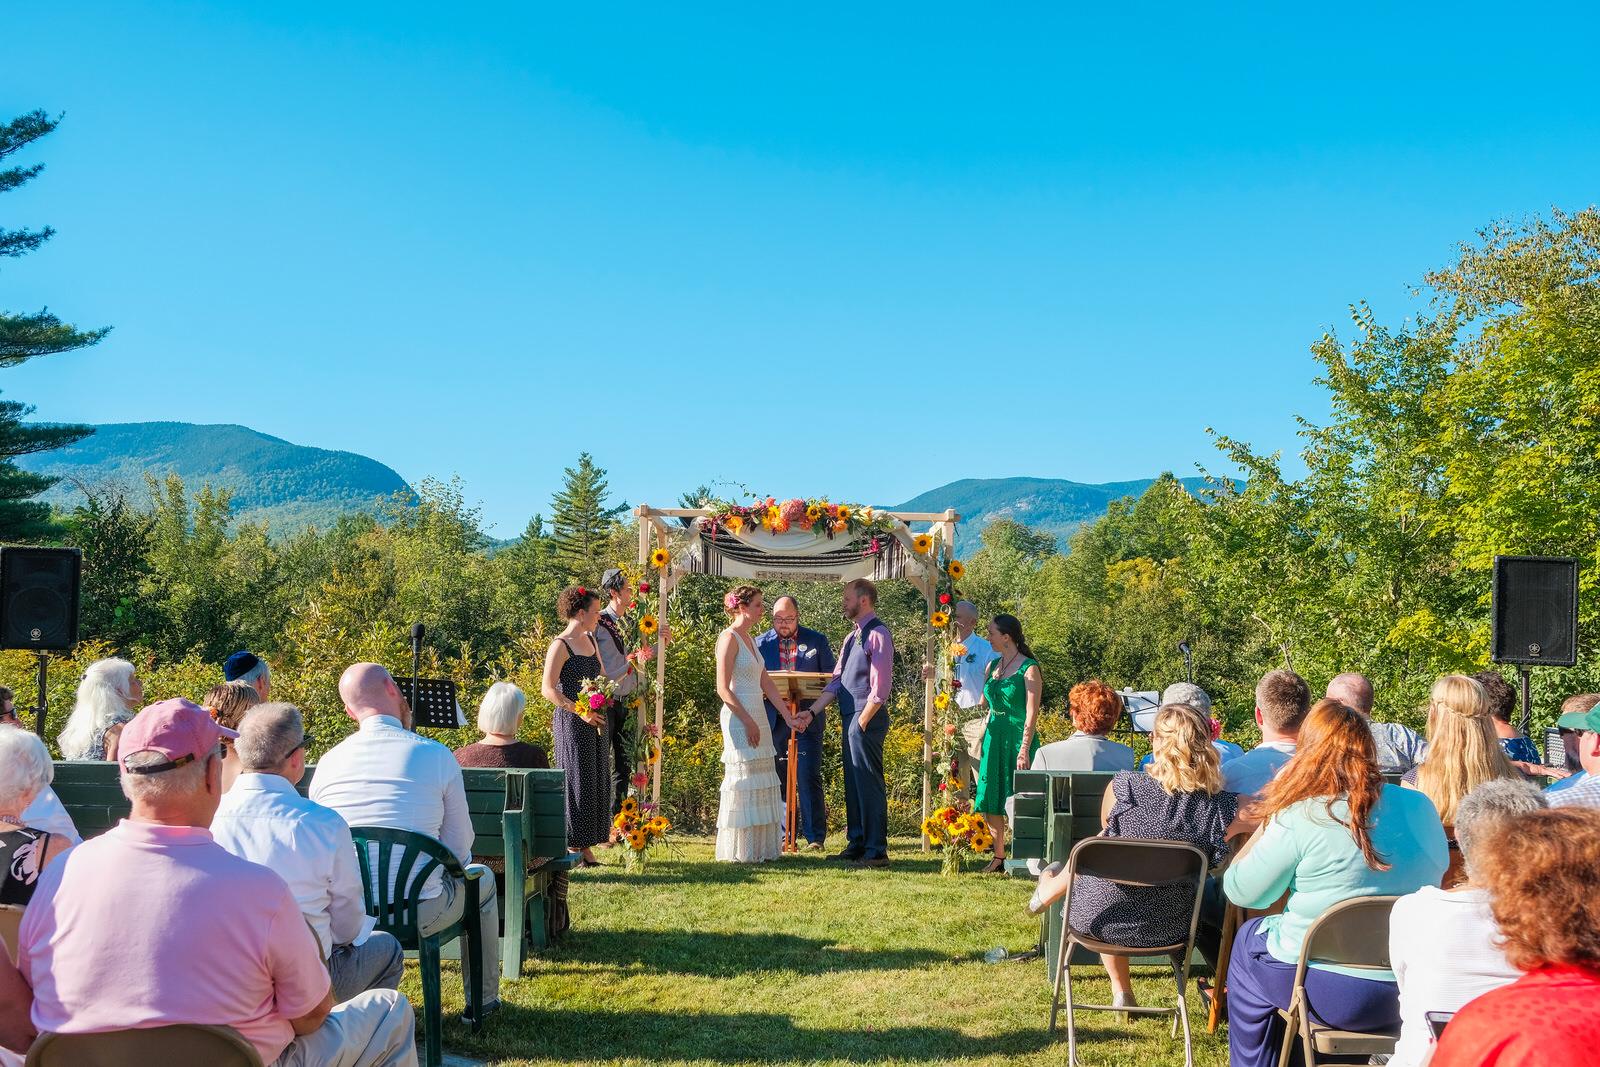 white-mountains-campground-wedding-1118.jpg